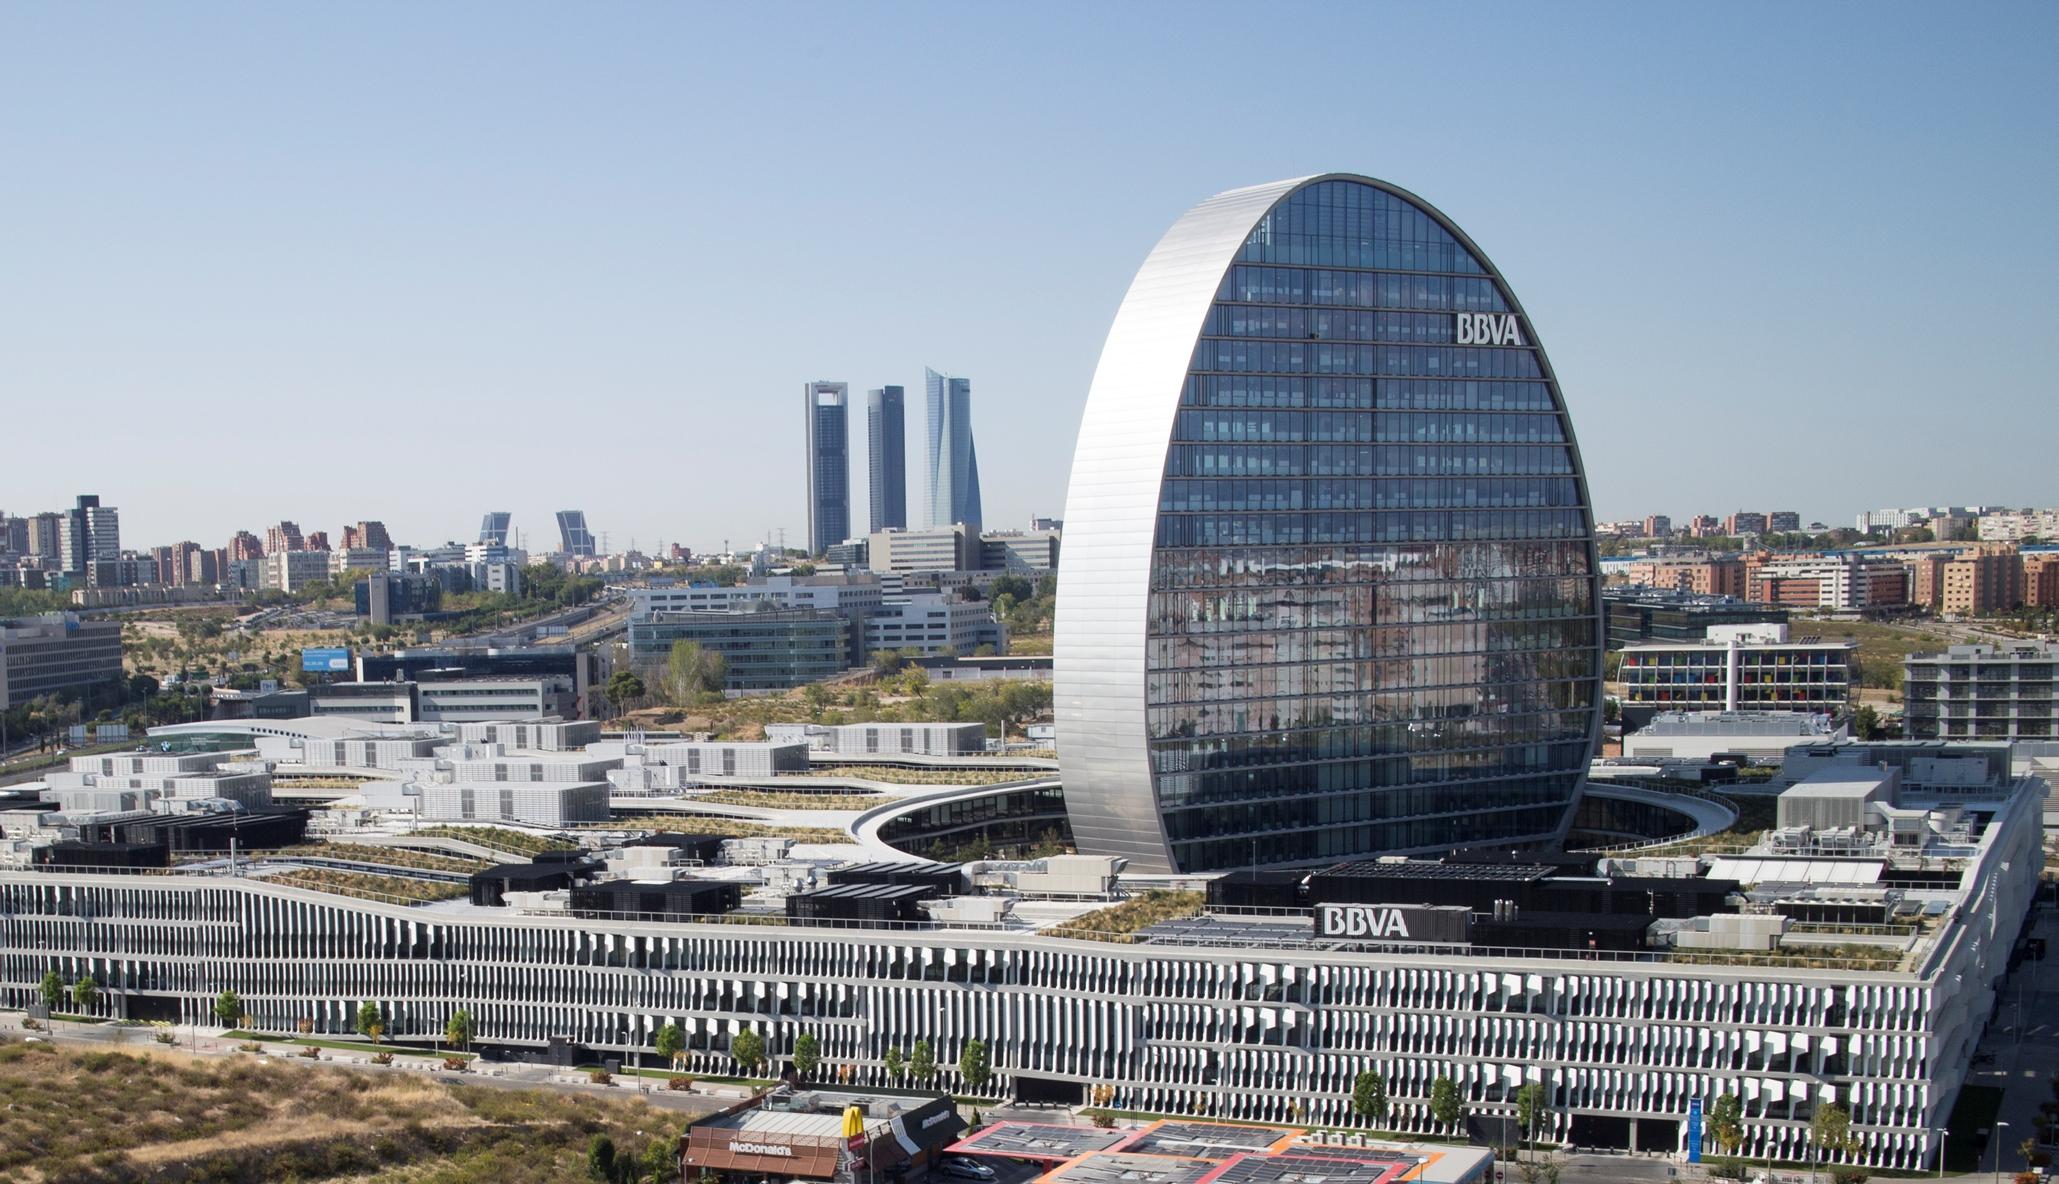 https://shareholdersandinvestors.bbva.com/wp-content/uploads/2017/05/vista-aerea-ciudad-bbva.jpg